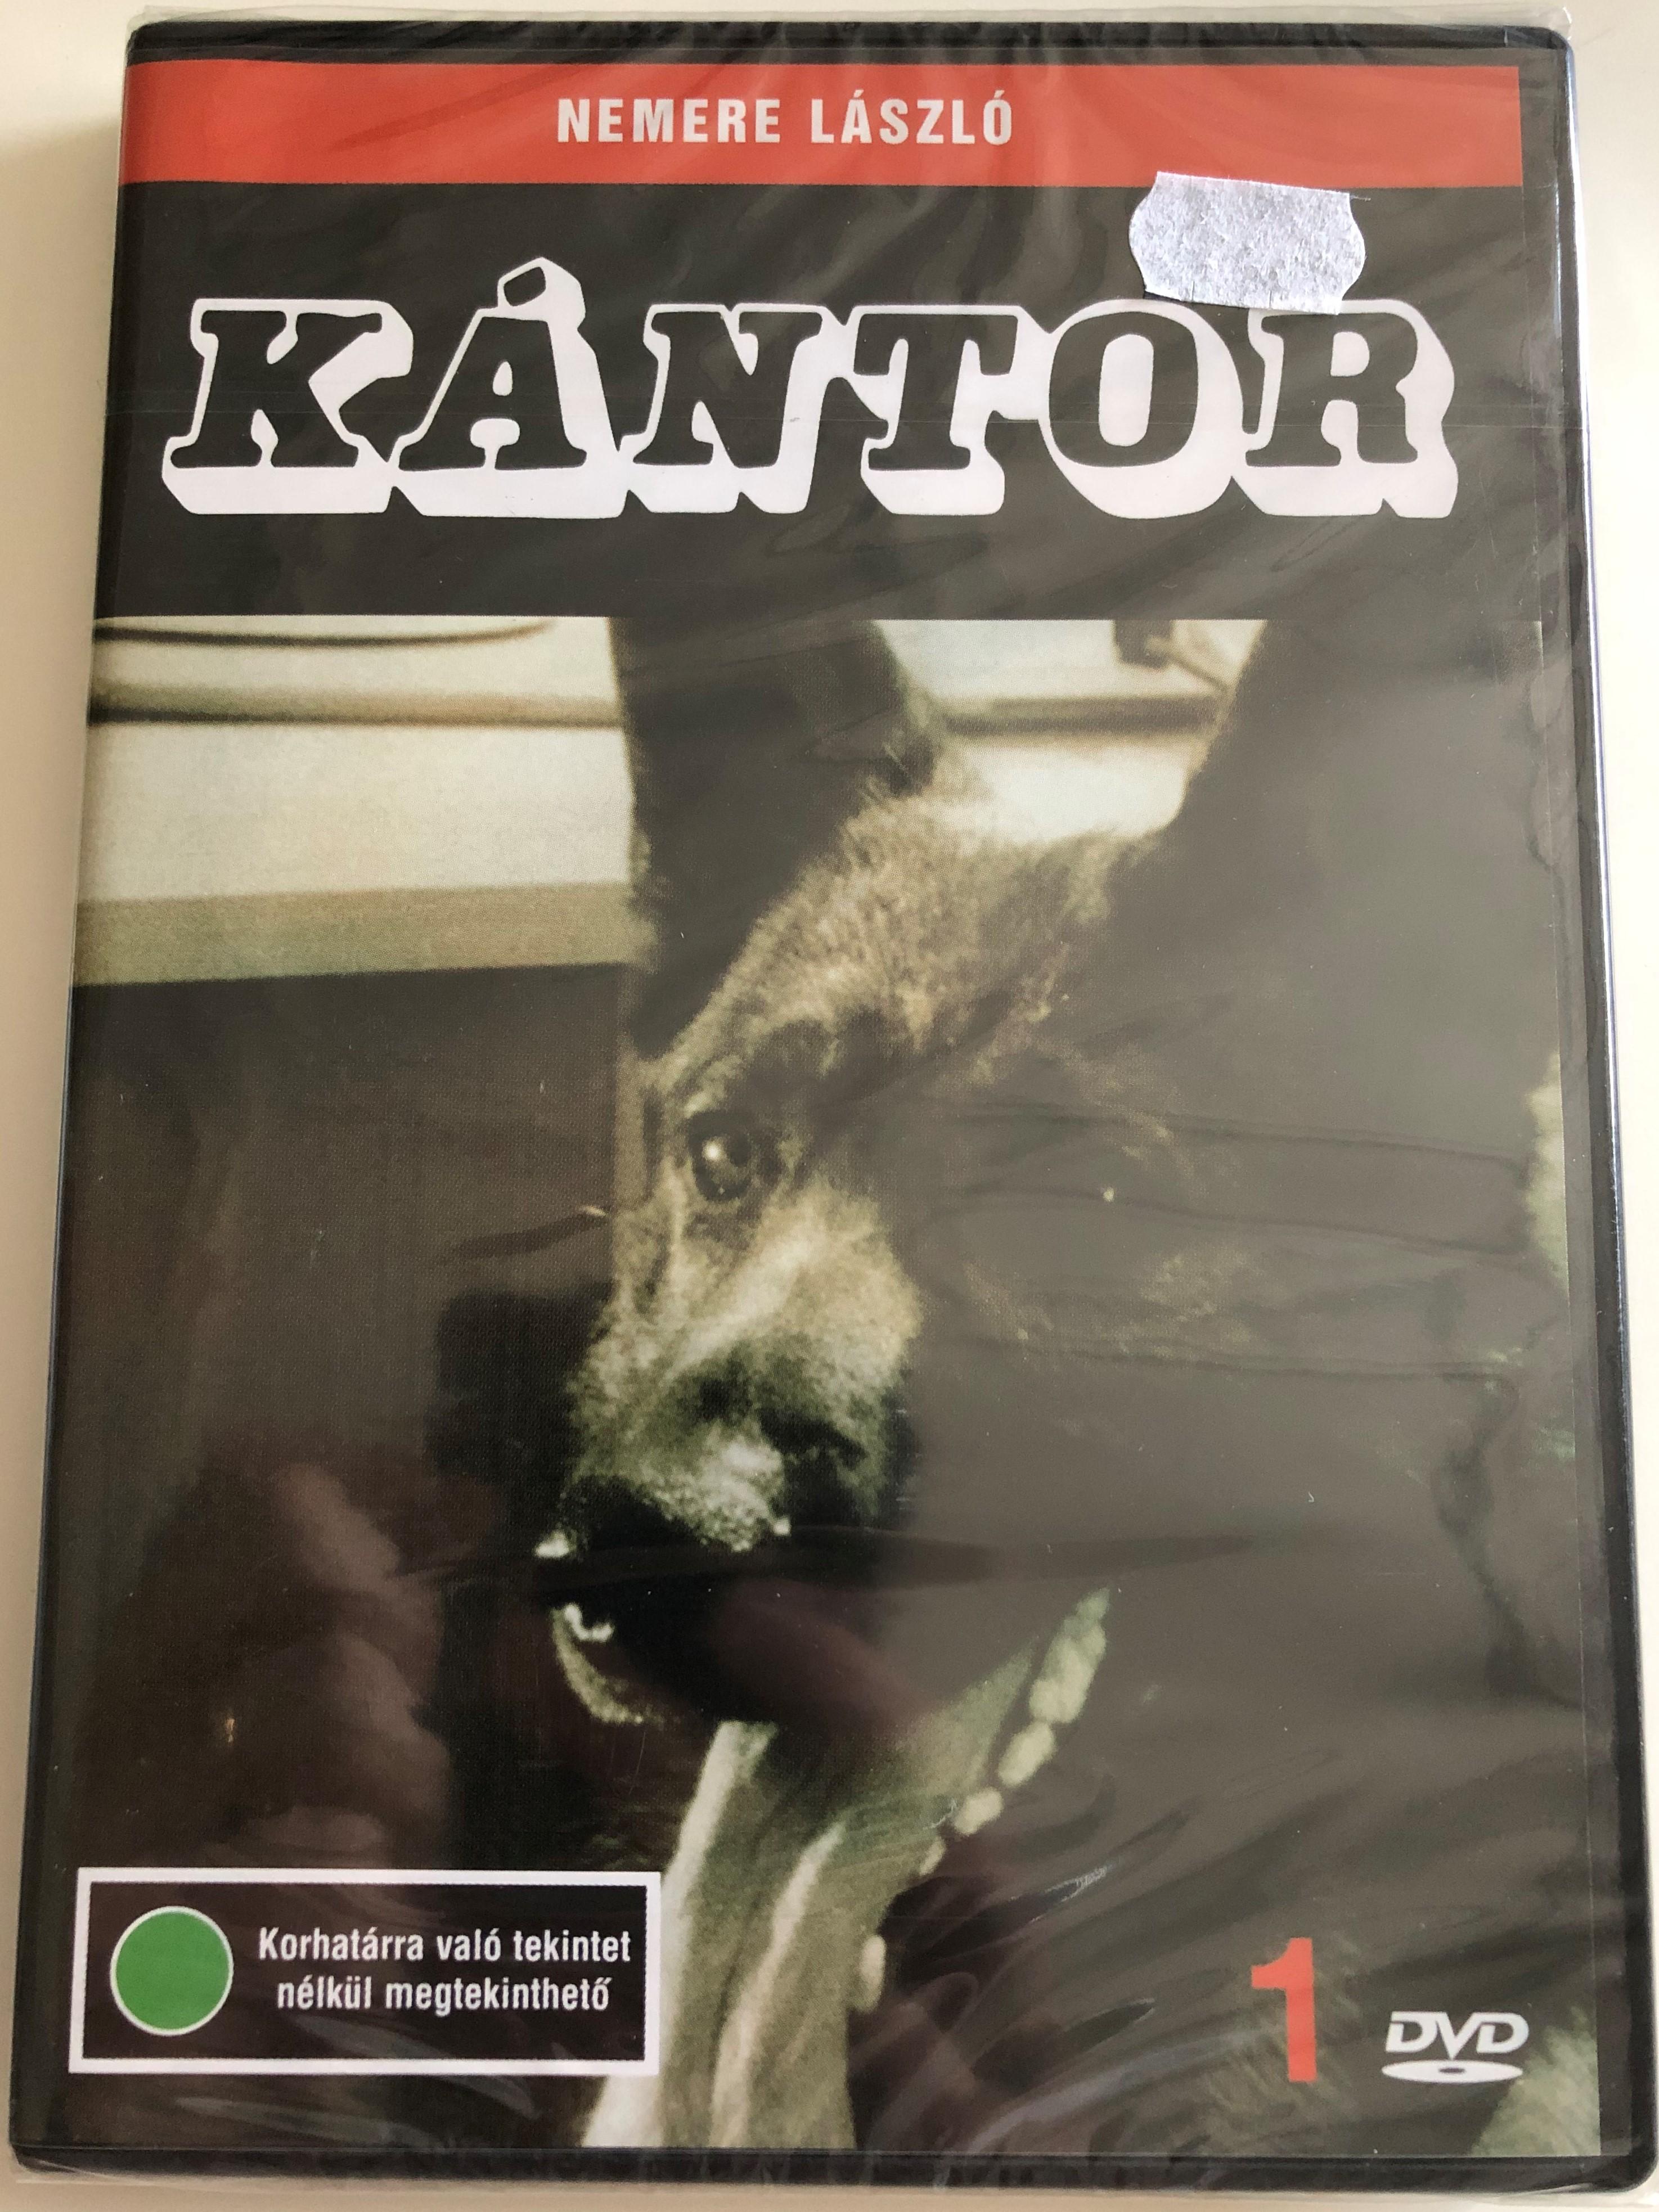 k-ntor-1.-dvd-directed-by-nemere-l-szl-1-.jpg